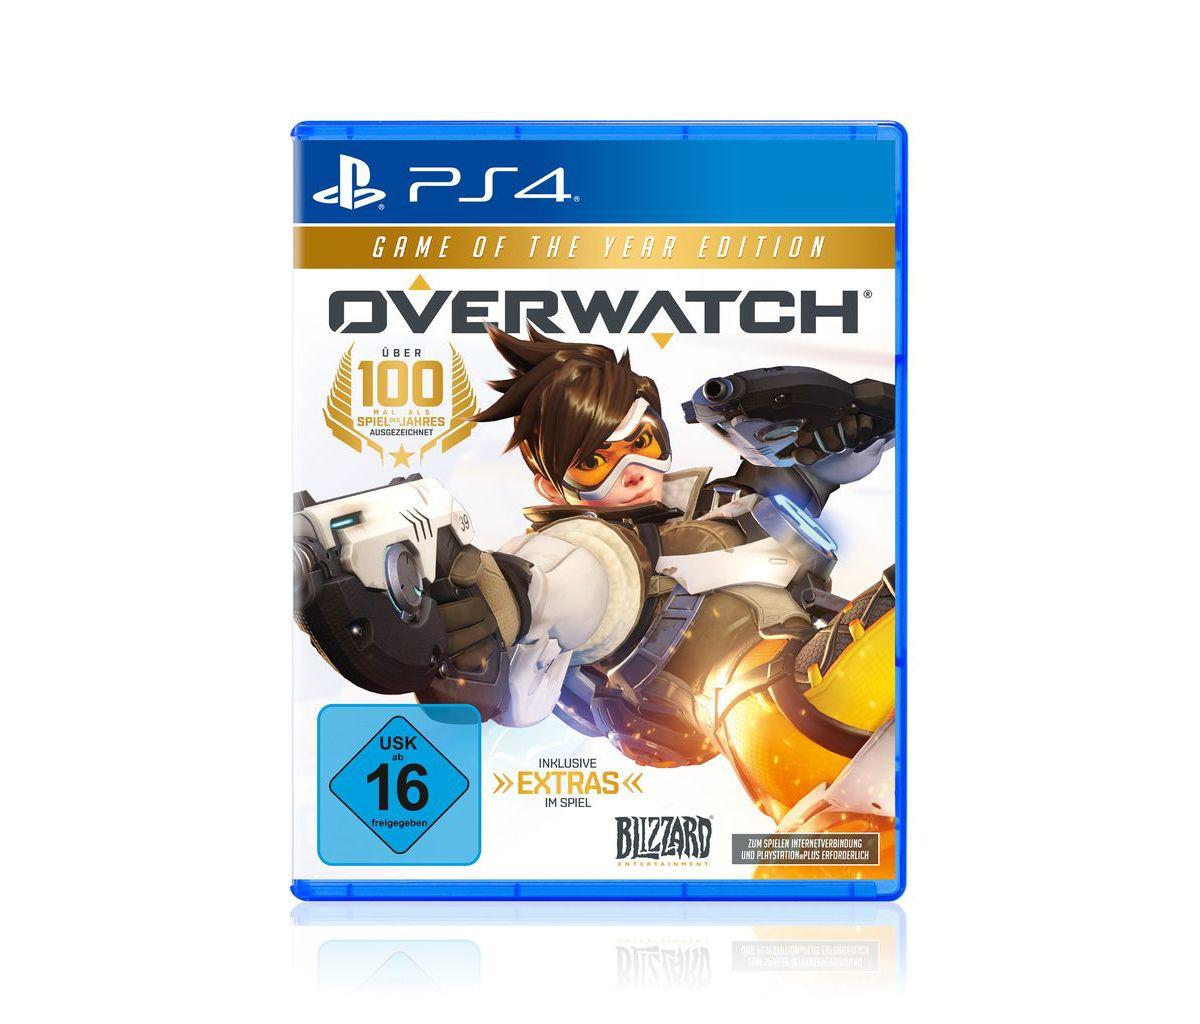 Aktuelle Angebote Kaufroboter Die Discounter Suchmaschine Ps 4 Slim New 500gb Fw 505 Blizzard Playstation Spiel Overwatch Game Of The Year Edition